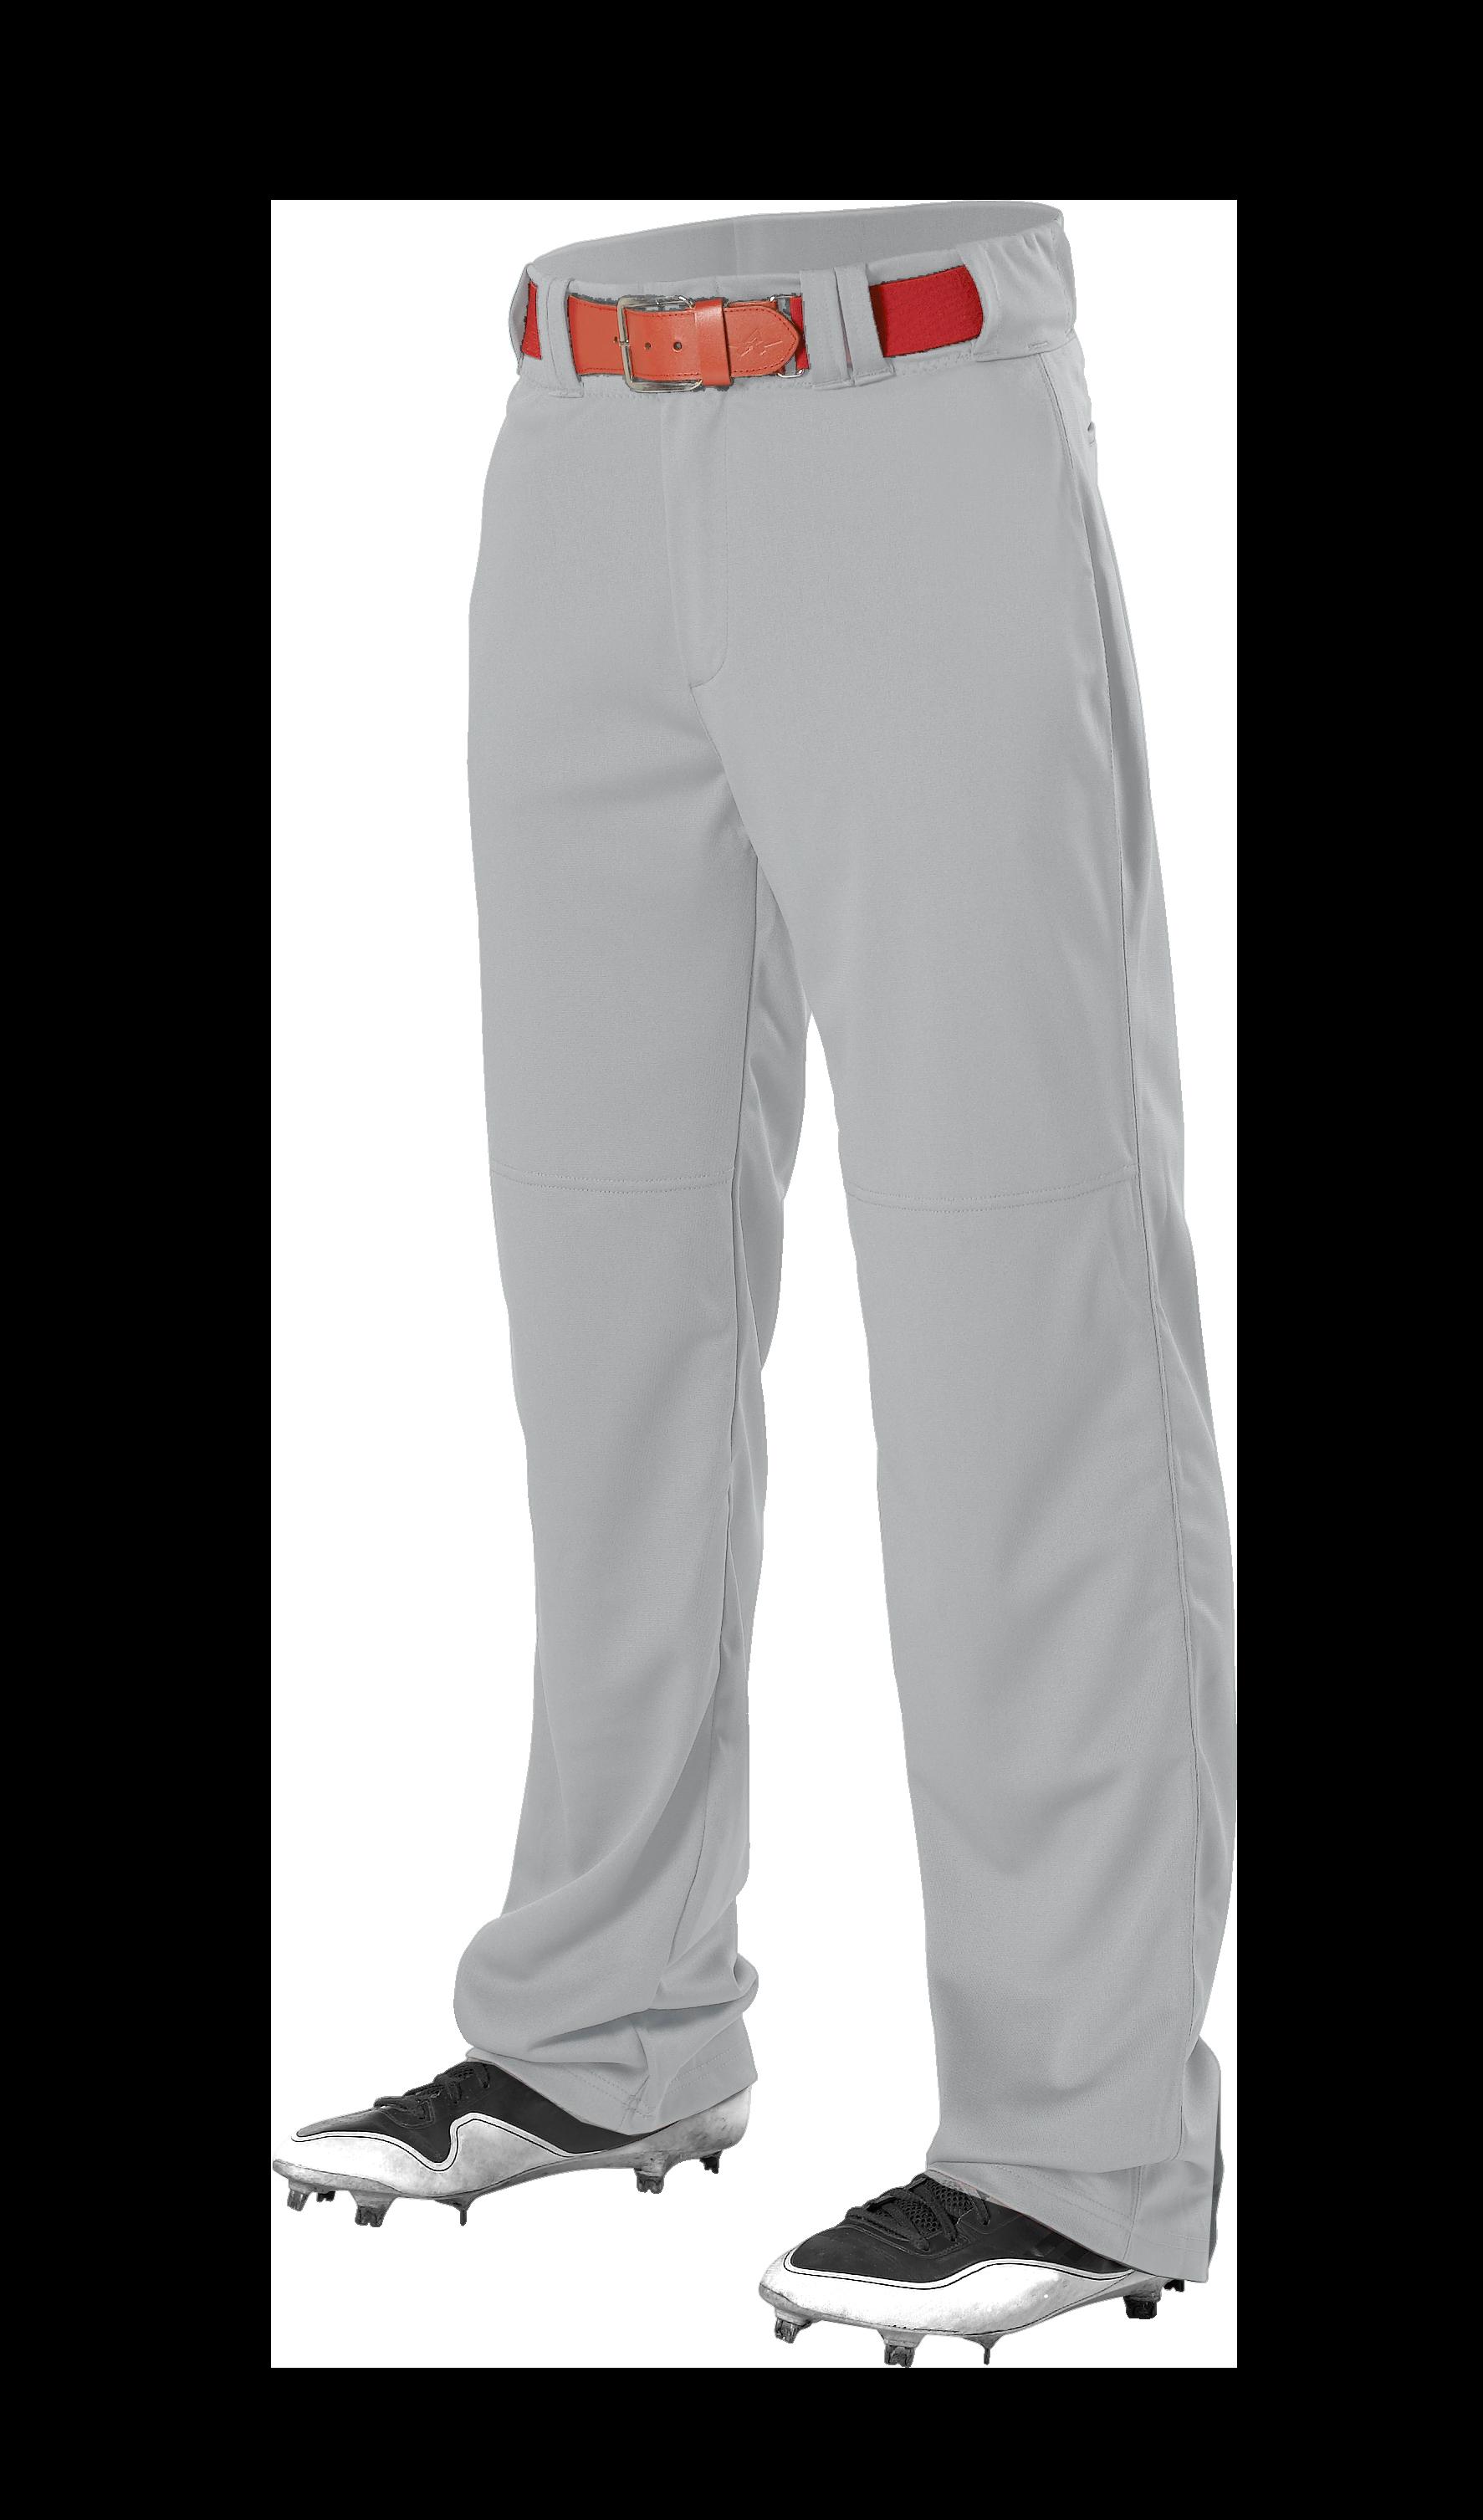 Youth Adjustable Inseam Baseball Pant - Grey